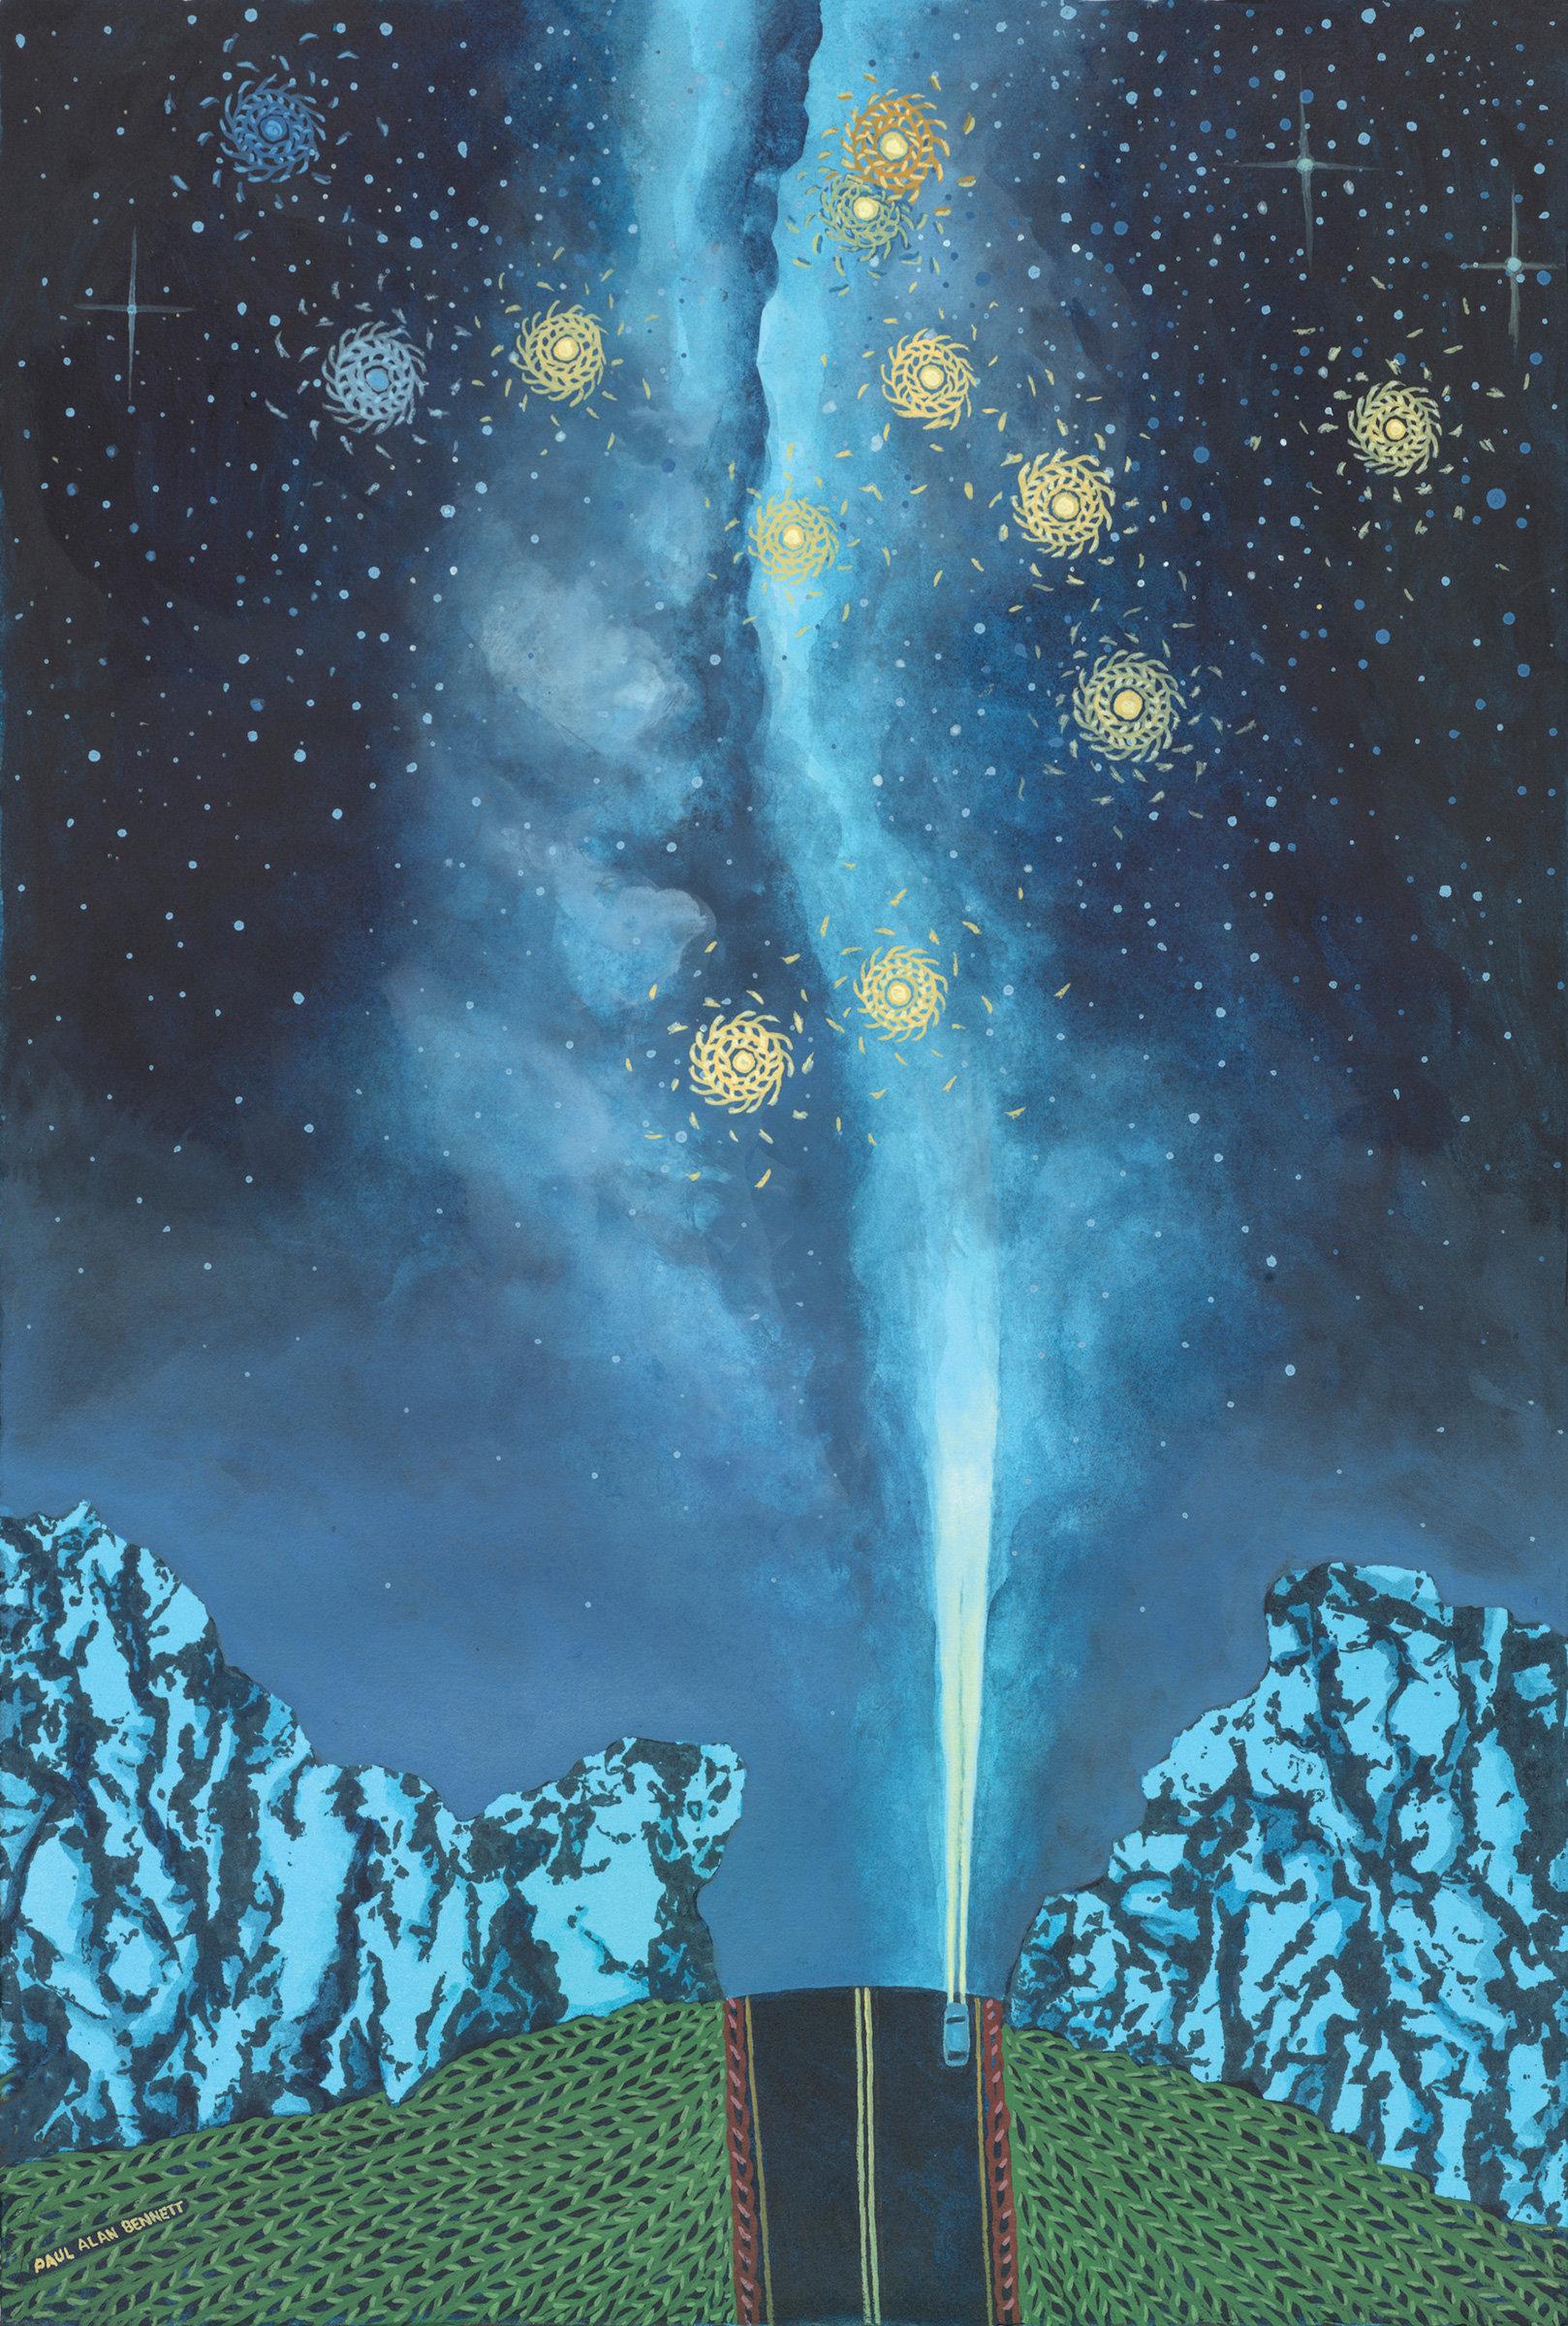 Driving Under The Phoenix Constellation By Paul Bennett